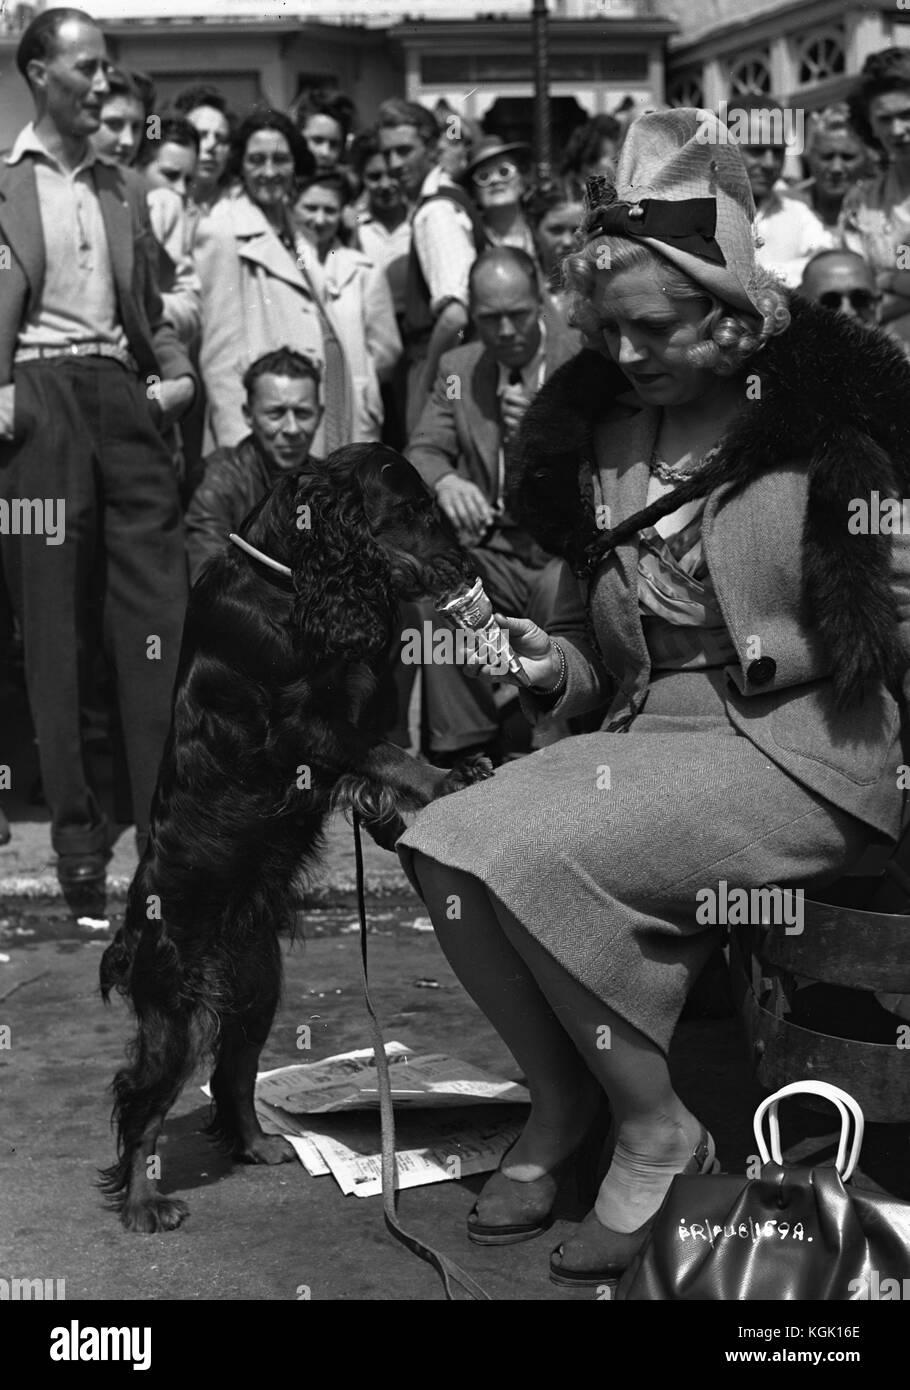 Rhoda Griffis,Joanne Whalley Sex fotos Vicki Davis,Bill Travers (1922?994)